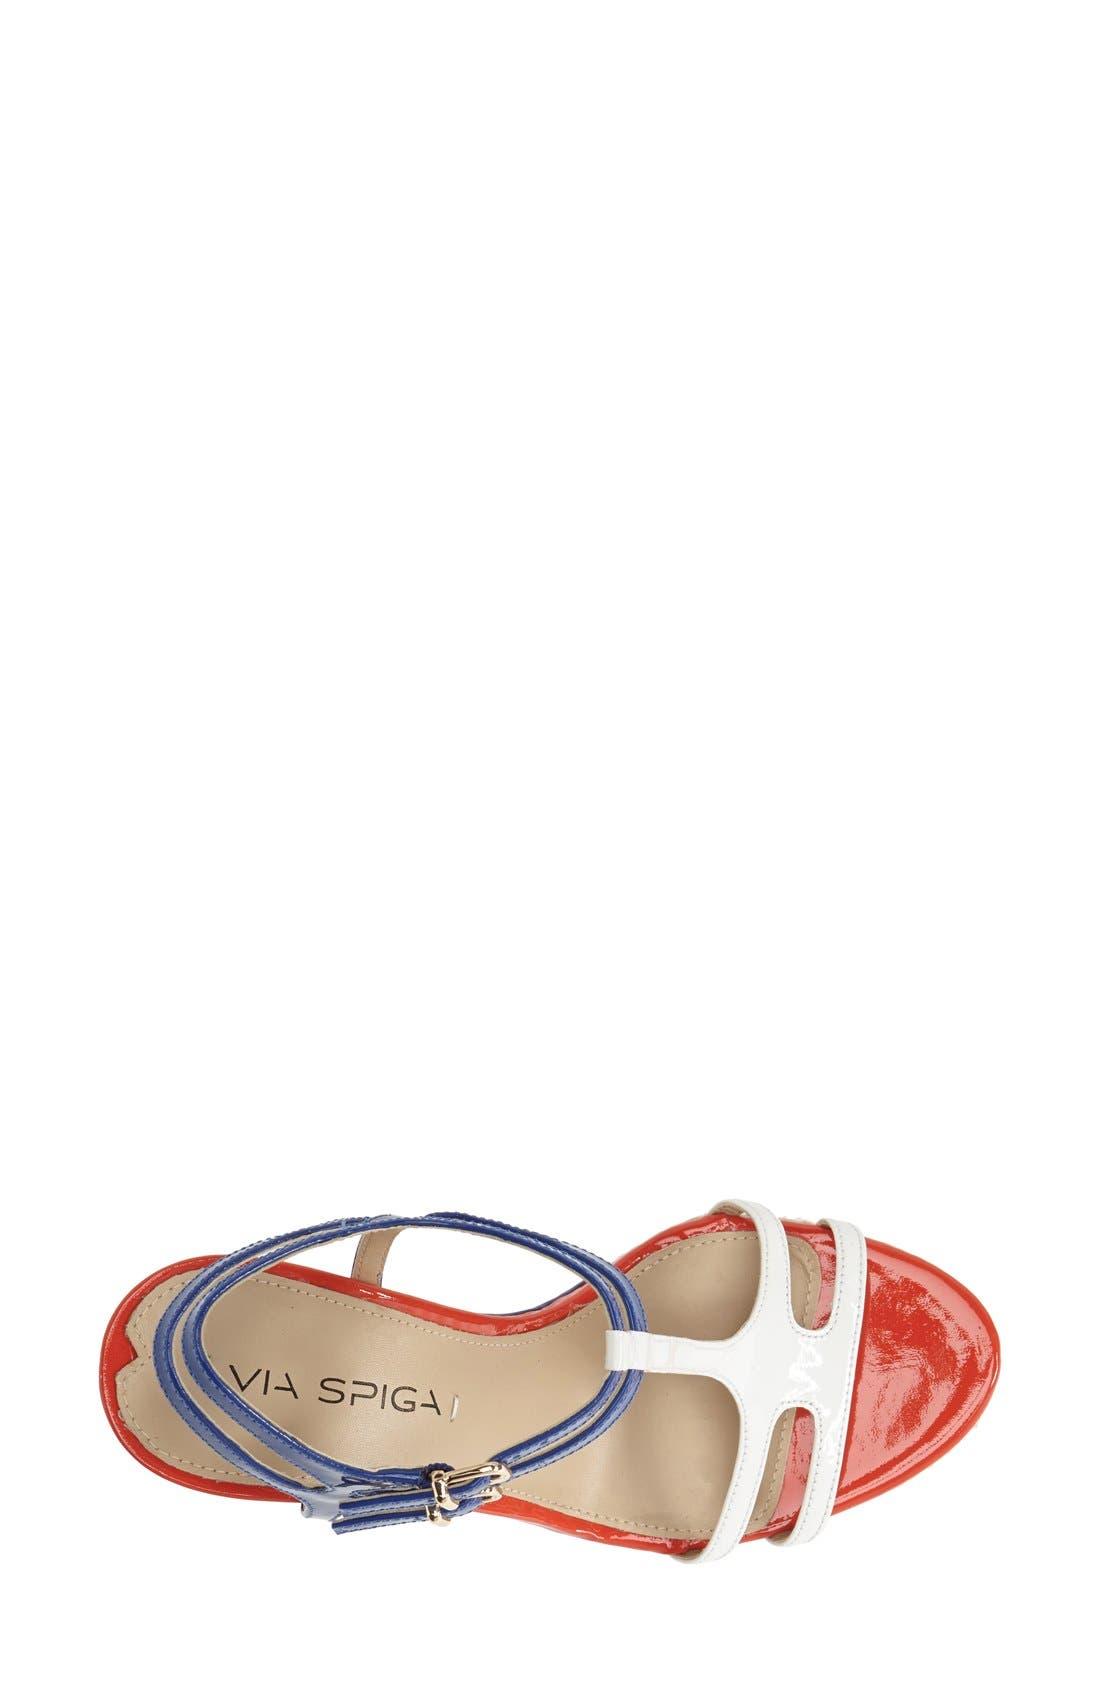 Alternate Image 3  - Via Spiga 'Meza' Leather Dual Ankle Strap Platform Wedge (Women) (Nordstrom Exclusive)